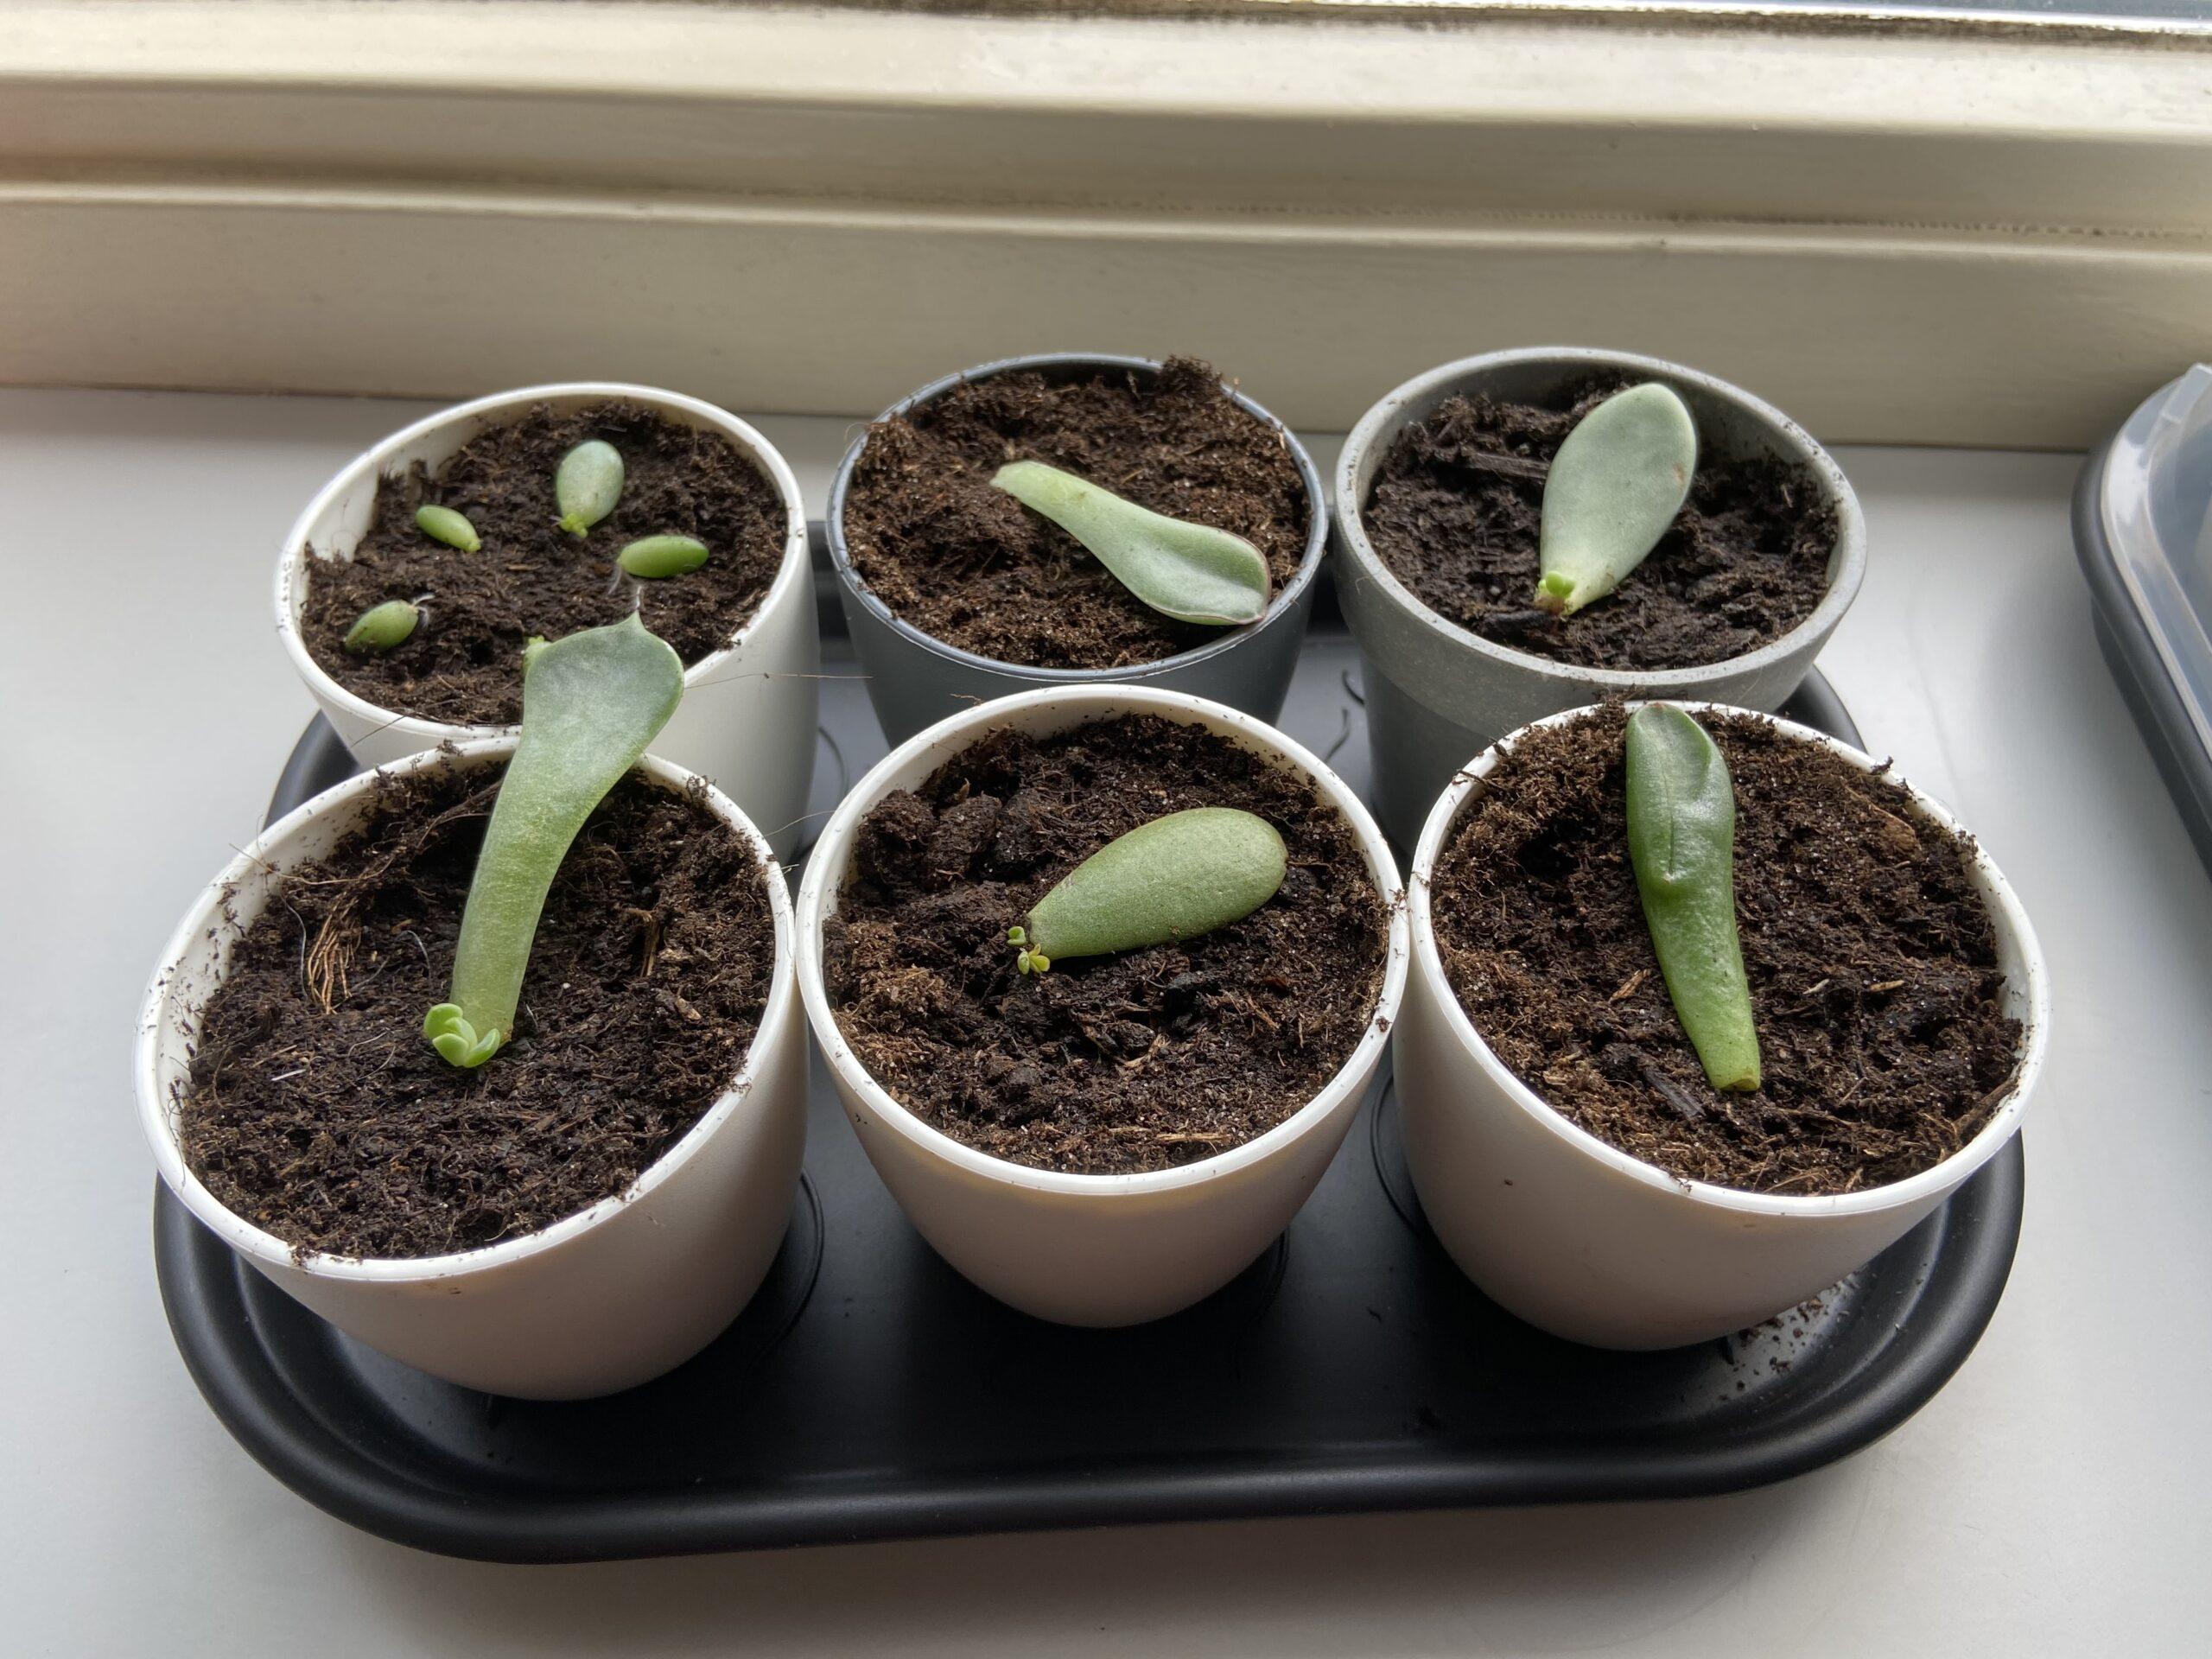 vetplantjes kweekbak